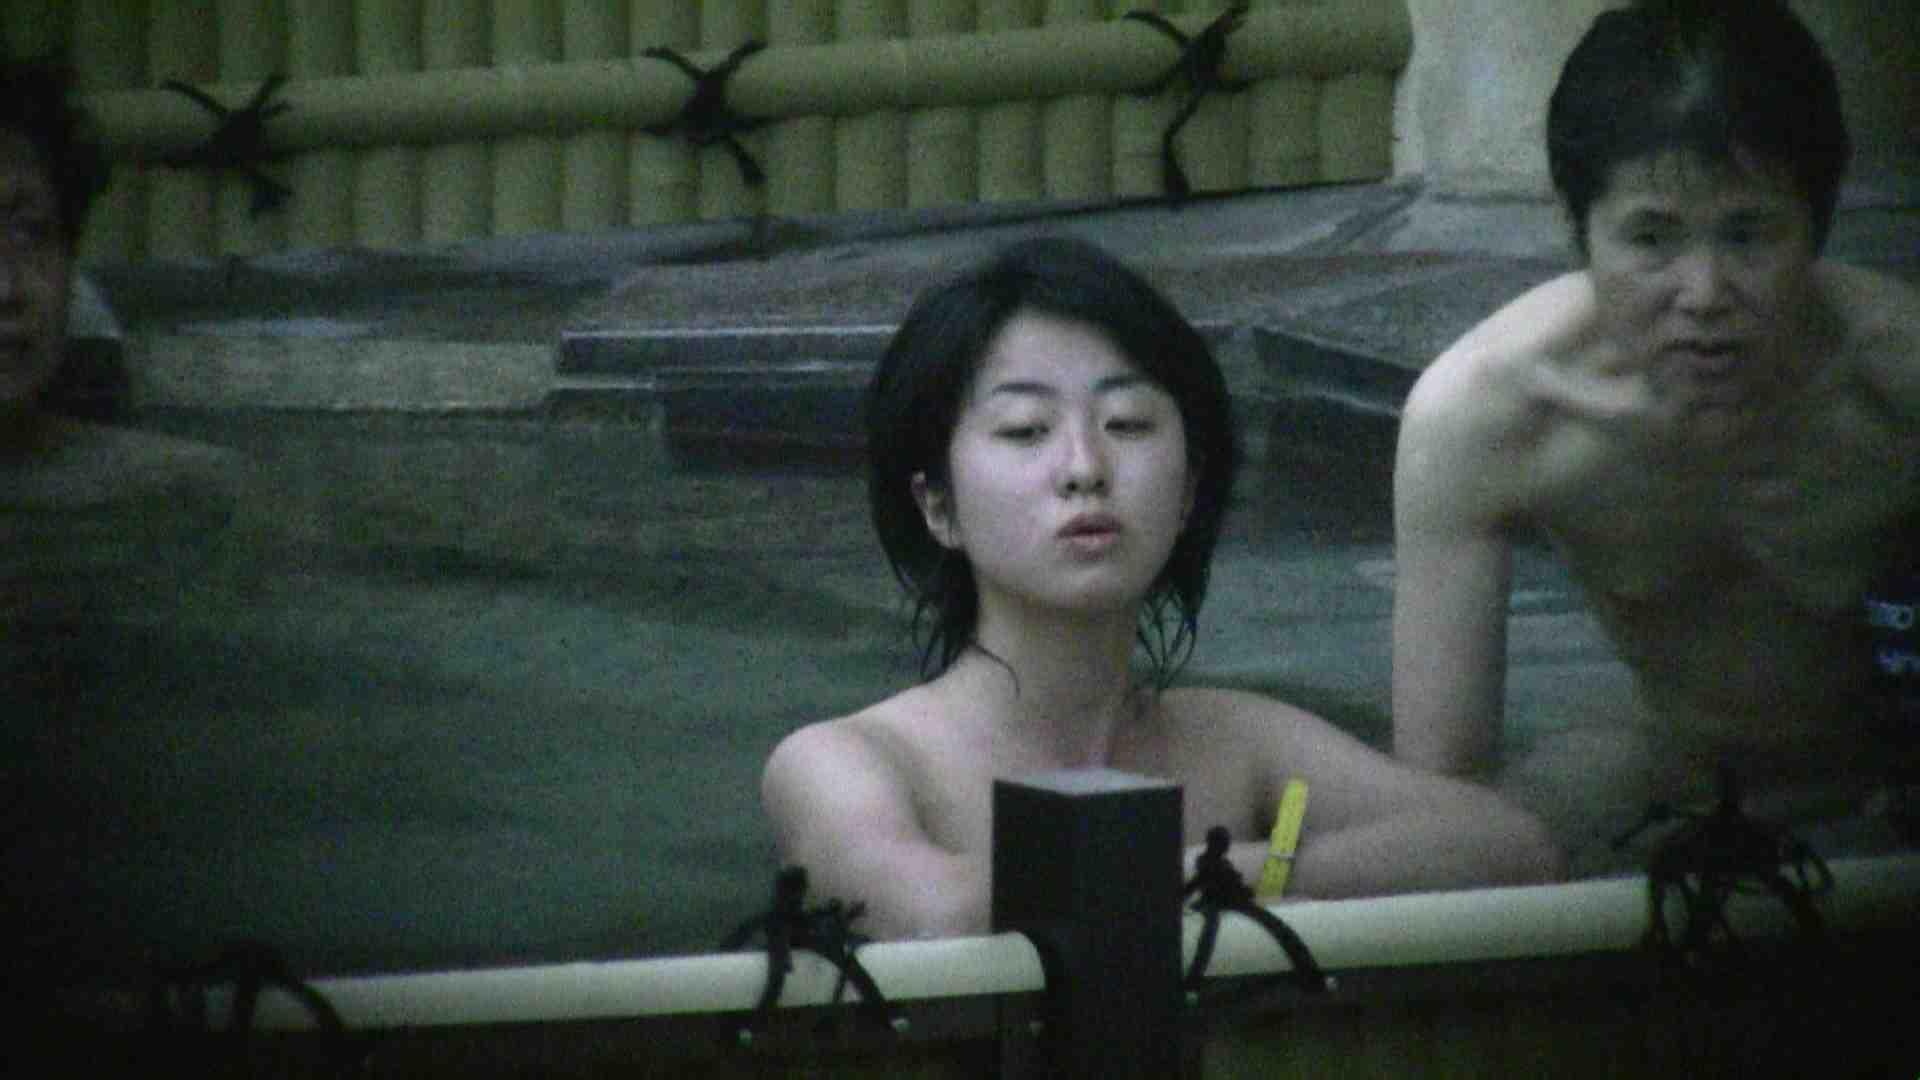 Aquaな露天風呂Vol.112 盗撮シリーズ   露天風呂編  93PIX 51